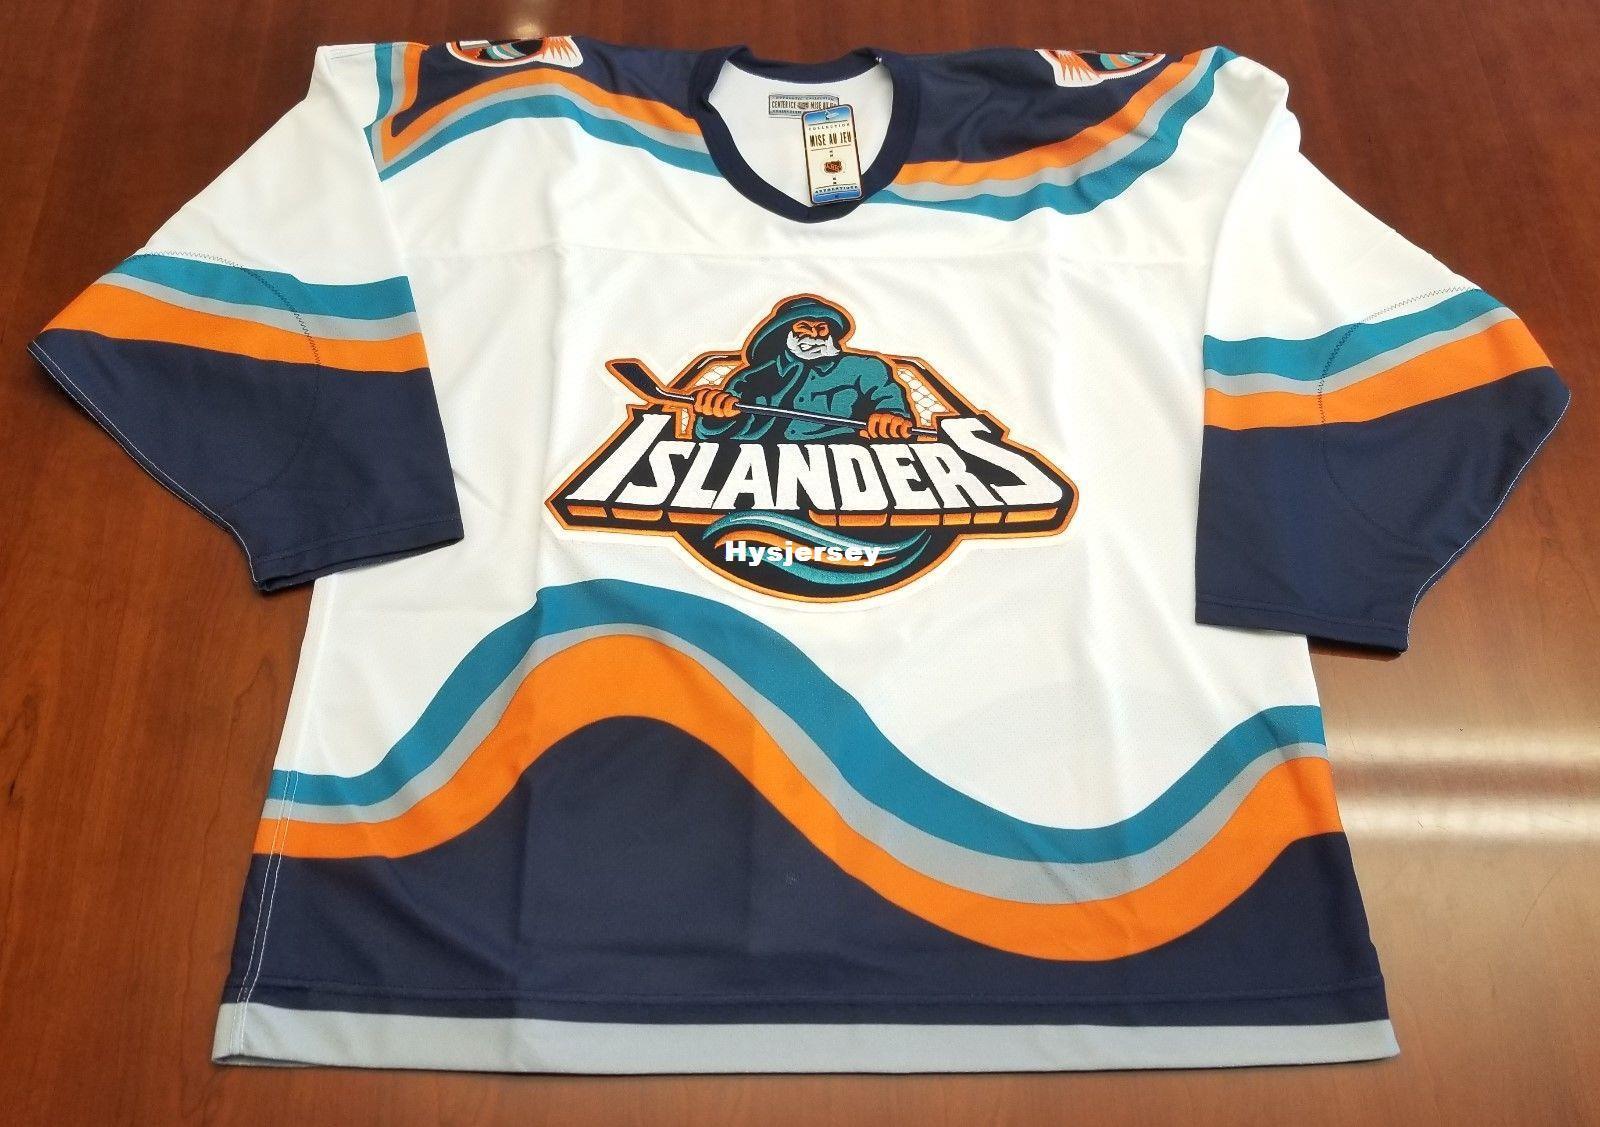 35a8f3e40 2019 Cheap New York Islanders Vintage CCM Cheap Center Ice Pro Hockey Jersey  Fisherman White Mens Retro Jerseys From Hysjersey, $24.53 | DHgate.Com